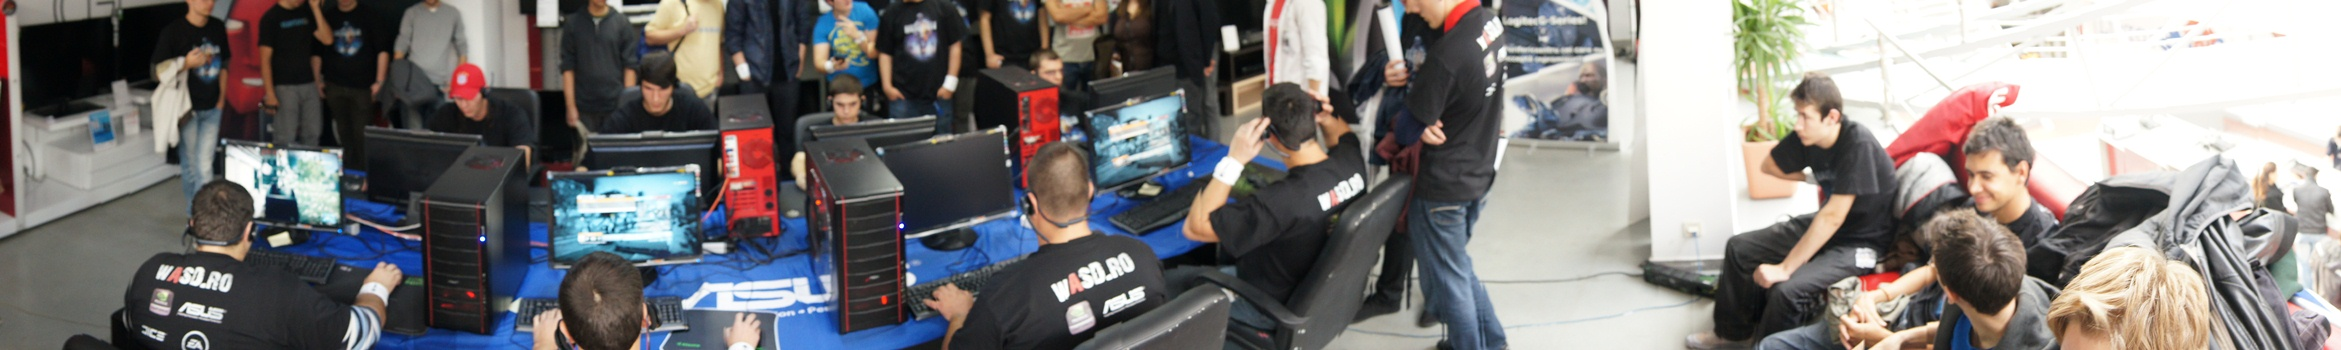 WASD Battlefield 3 WARDAY